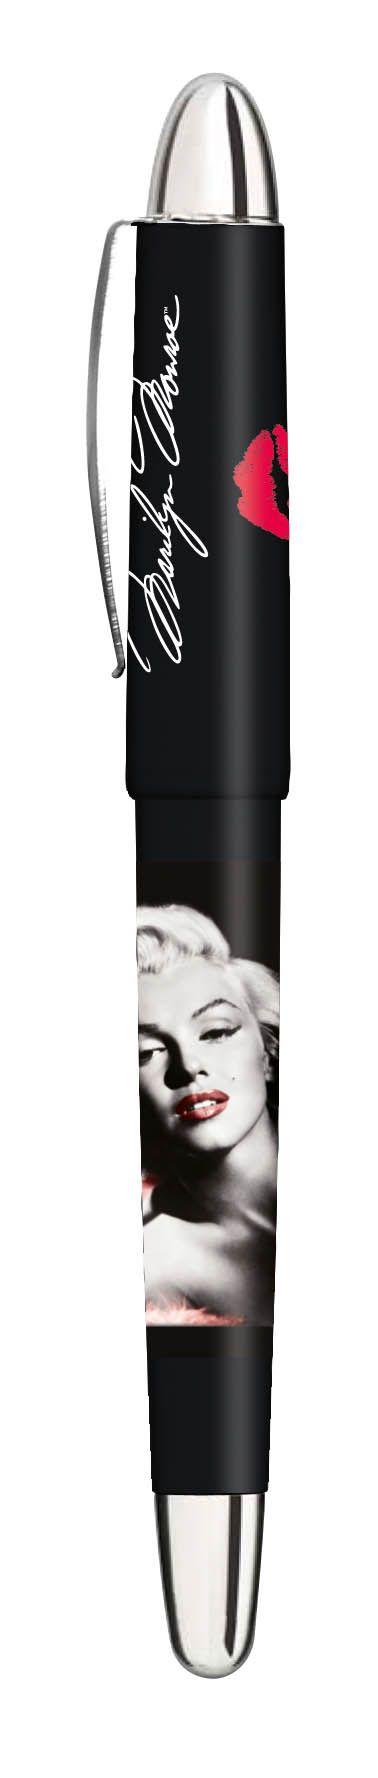 Roller premium pen Marilyn Monroe